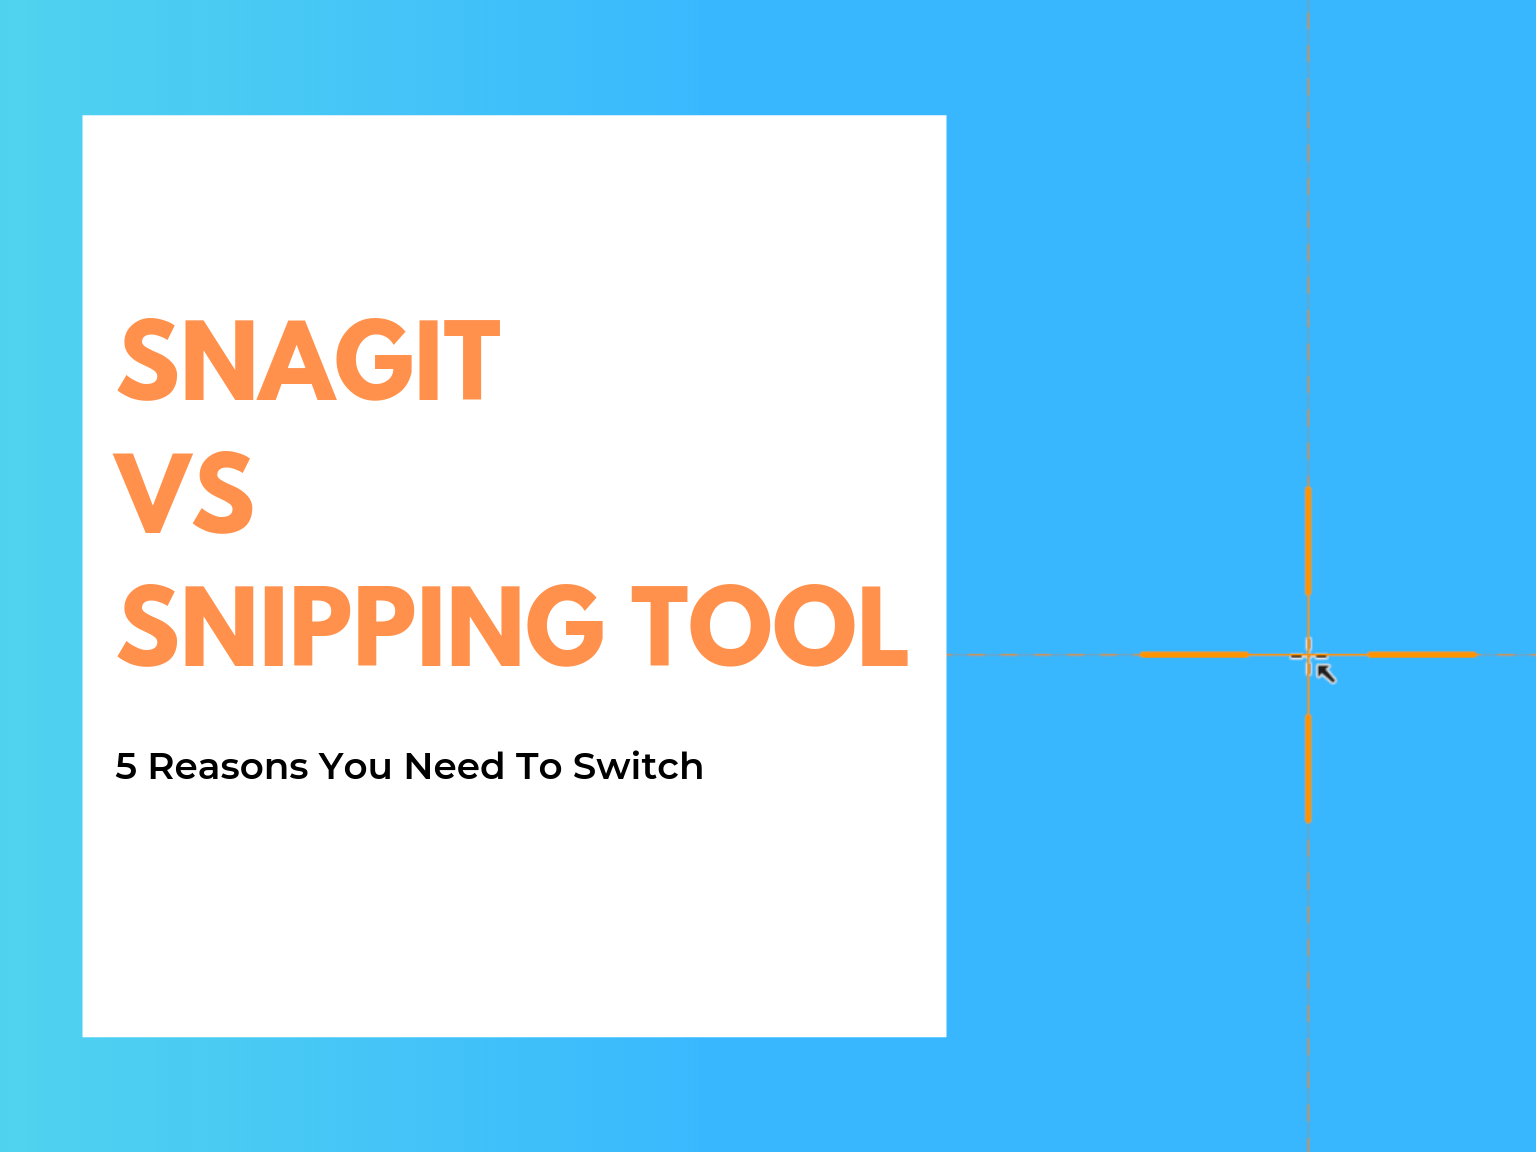 snagit vs snipping tool